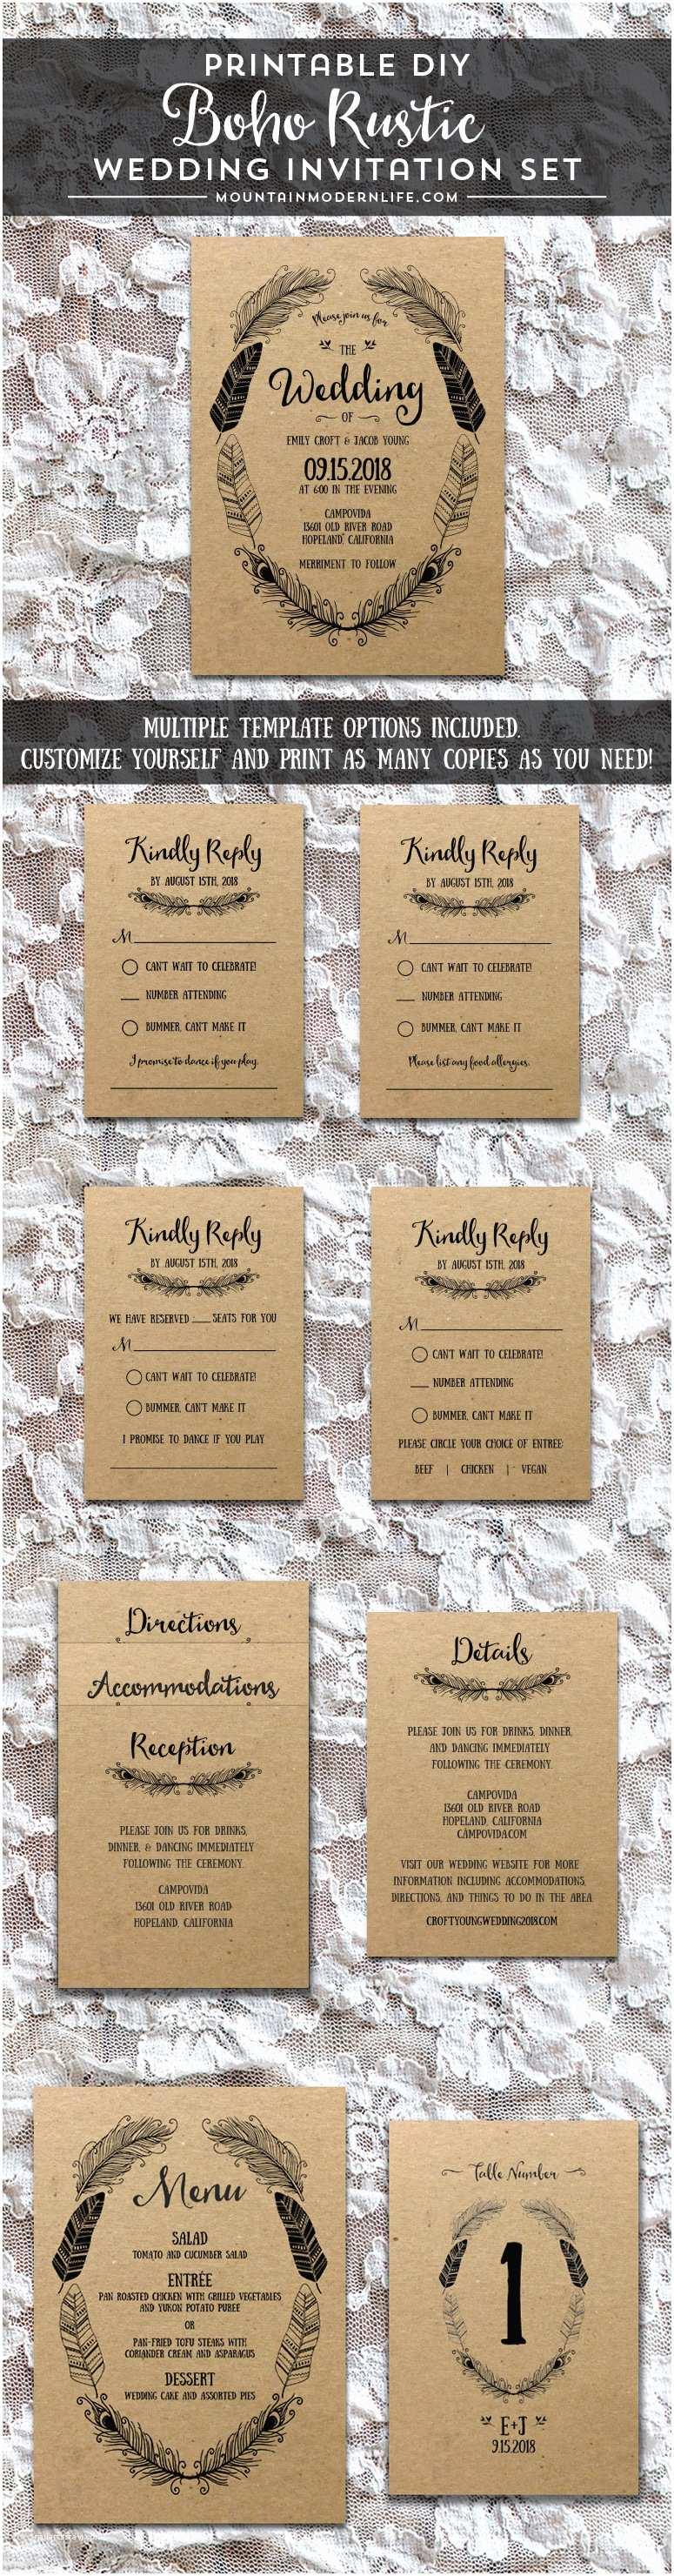 Rustic Wedding Invitation Sets Rustic Boho Diy Invitation Set